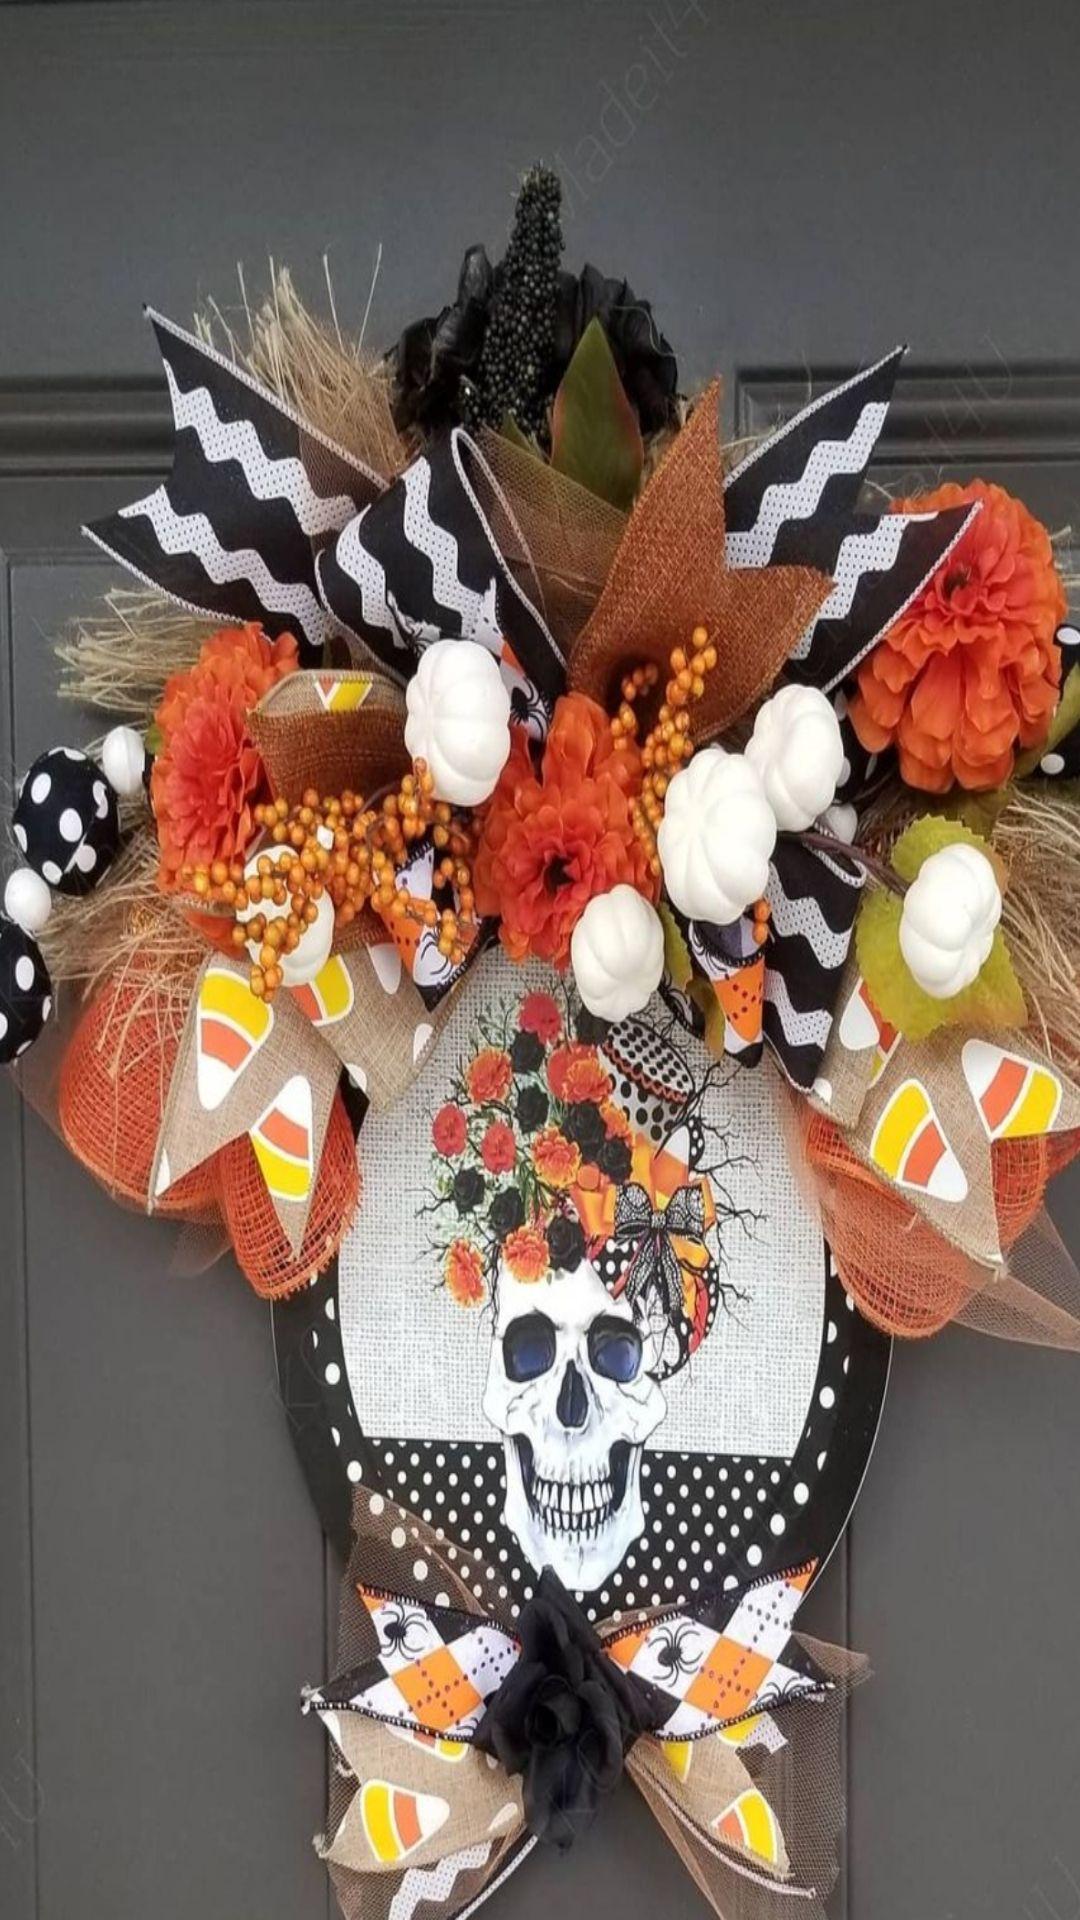 Spookly and creepy DIY Halloween wreath ideas 2021